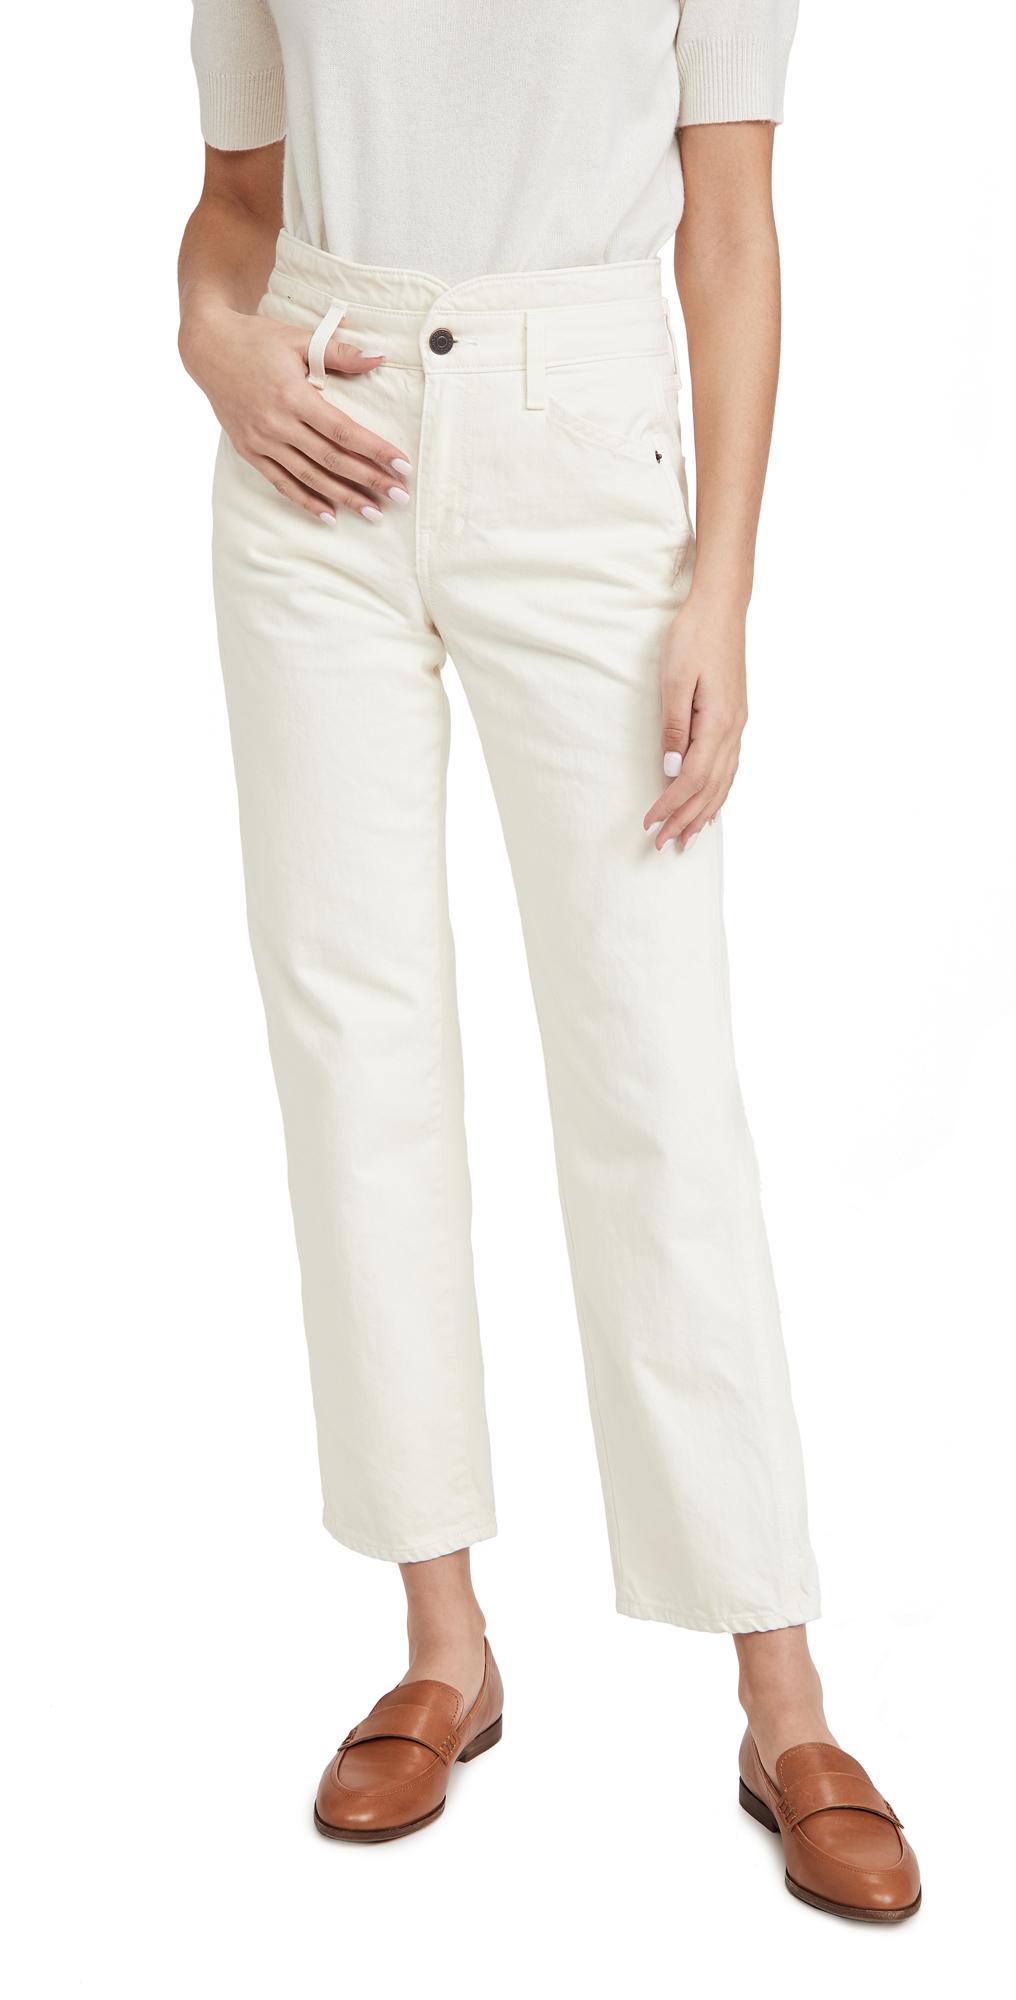 Veronica Beard Jean Blake Straight with Notch Jeans